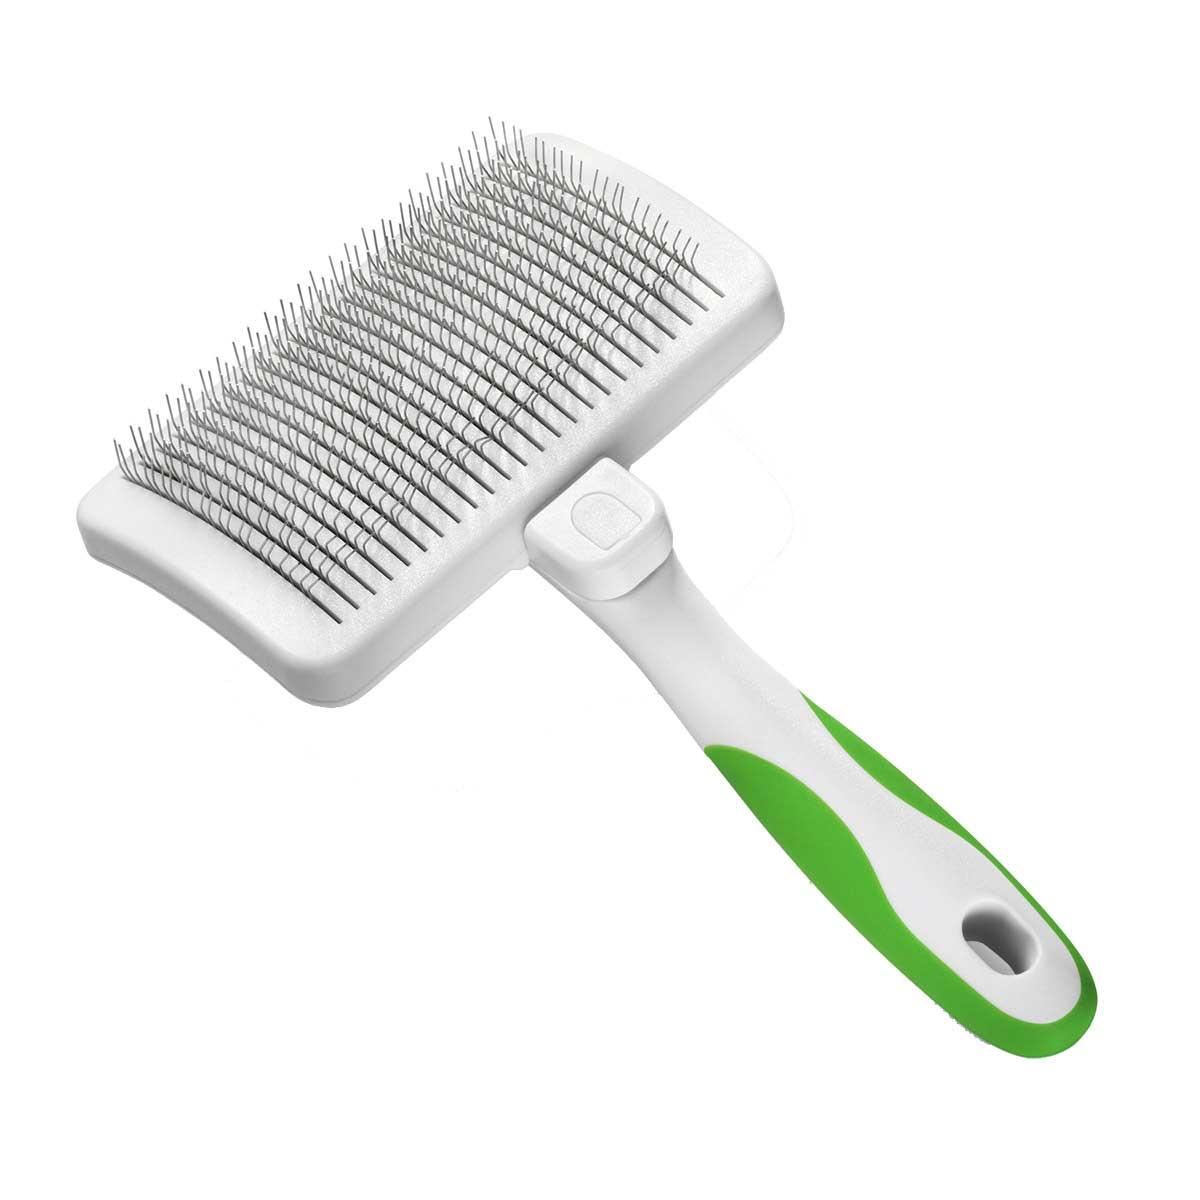 Andis Self-Cleaning Slicker Brush at Ryan's Pet Supplies